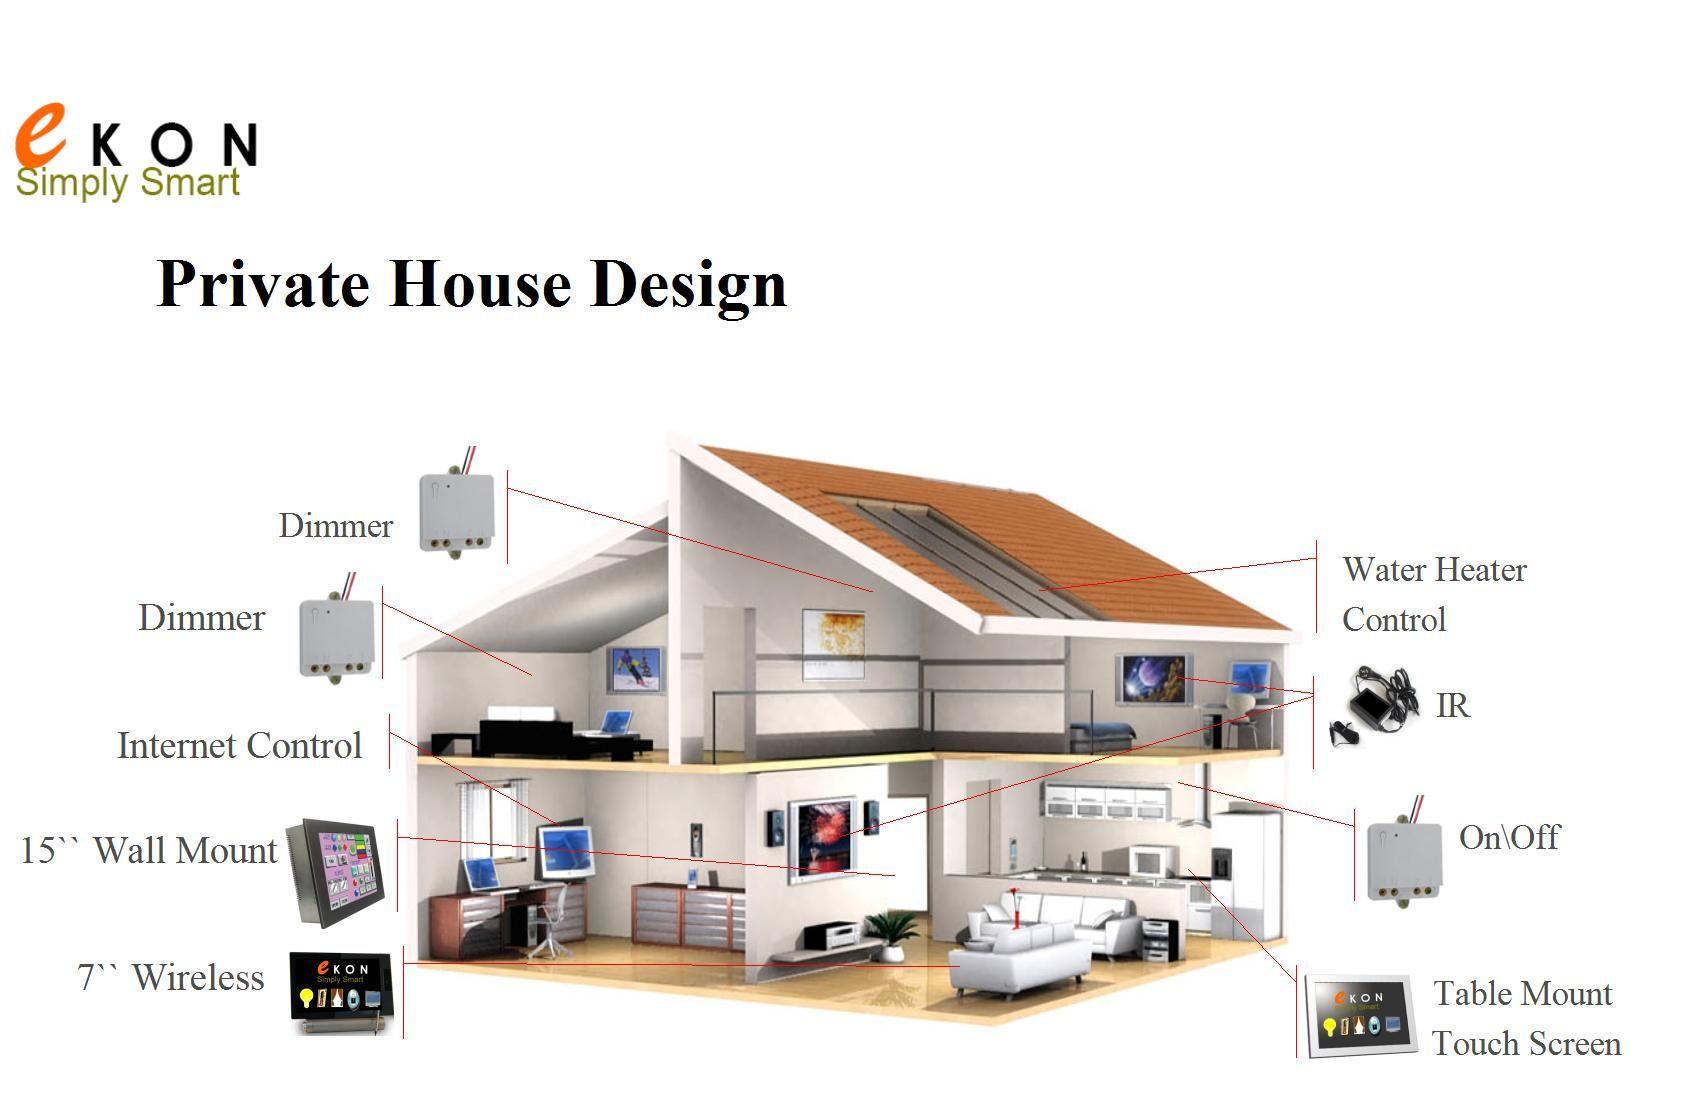 Smart Home Google 搜尋 Smart Home Design House Design Home Technology